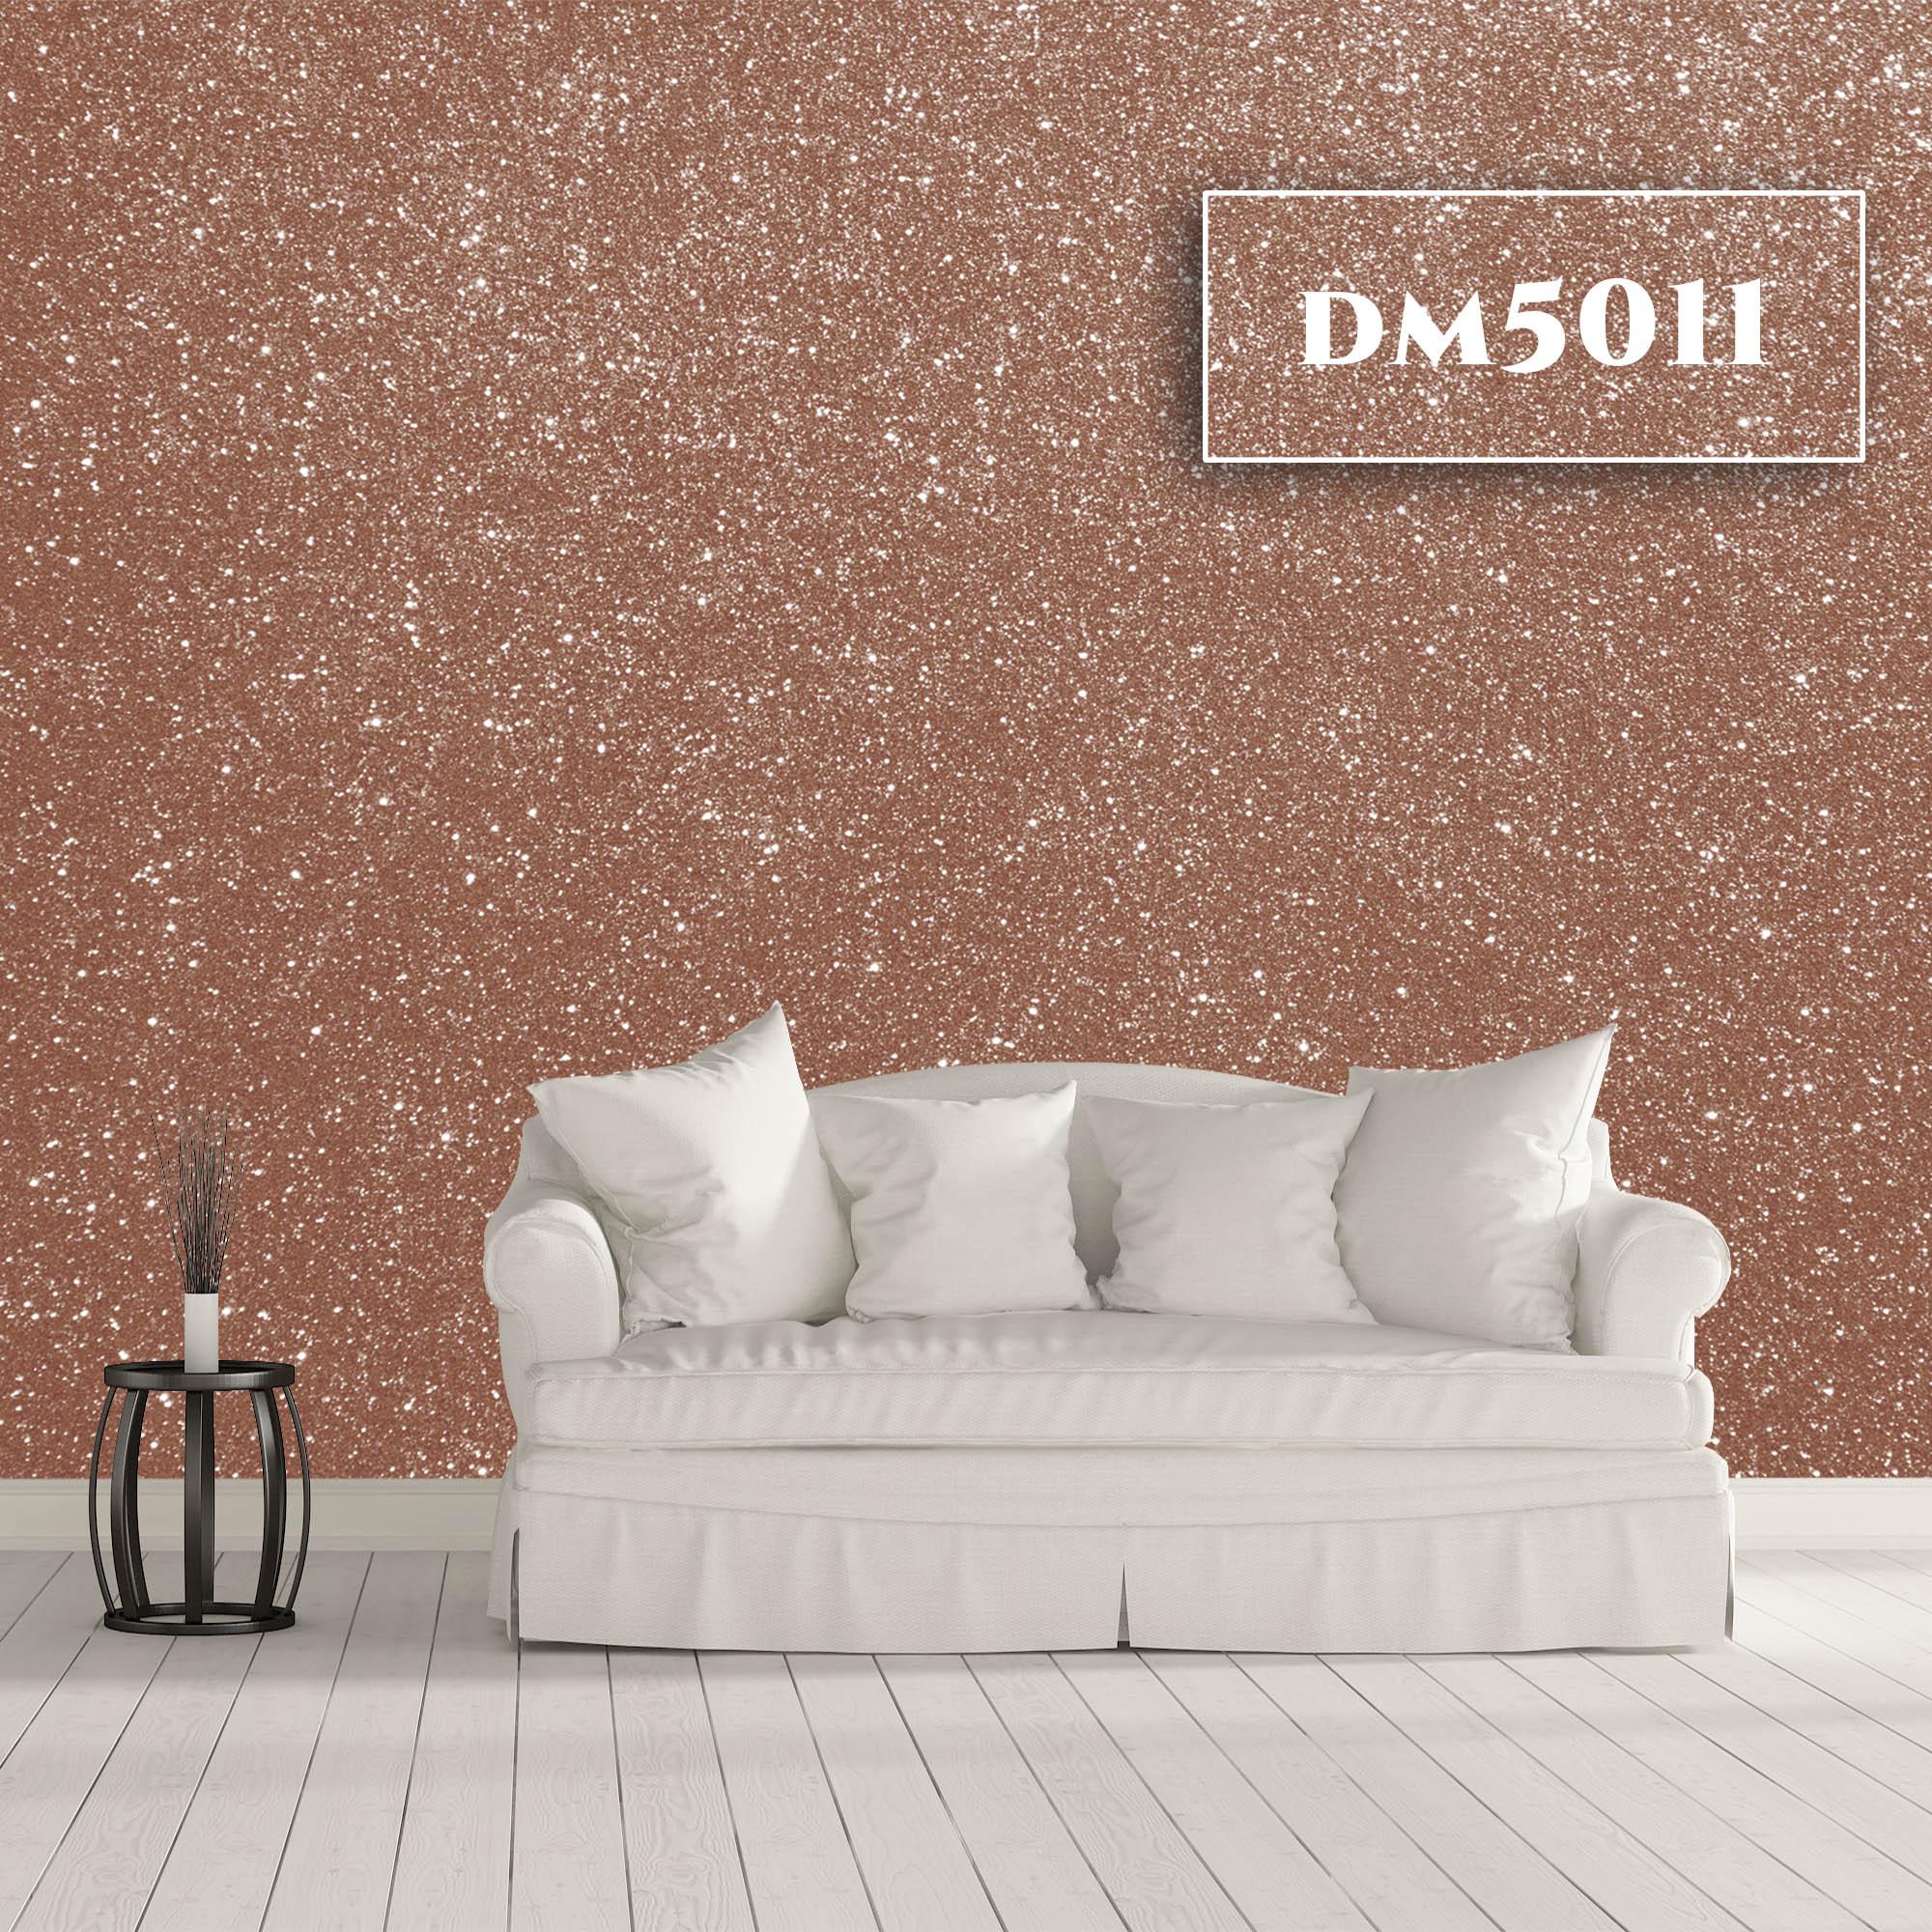 DM5011